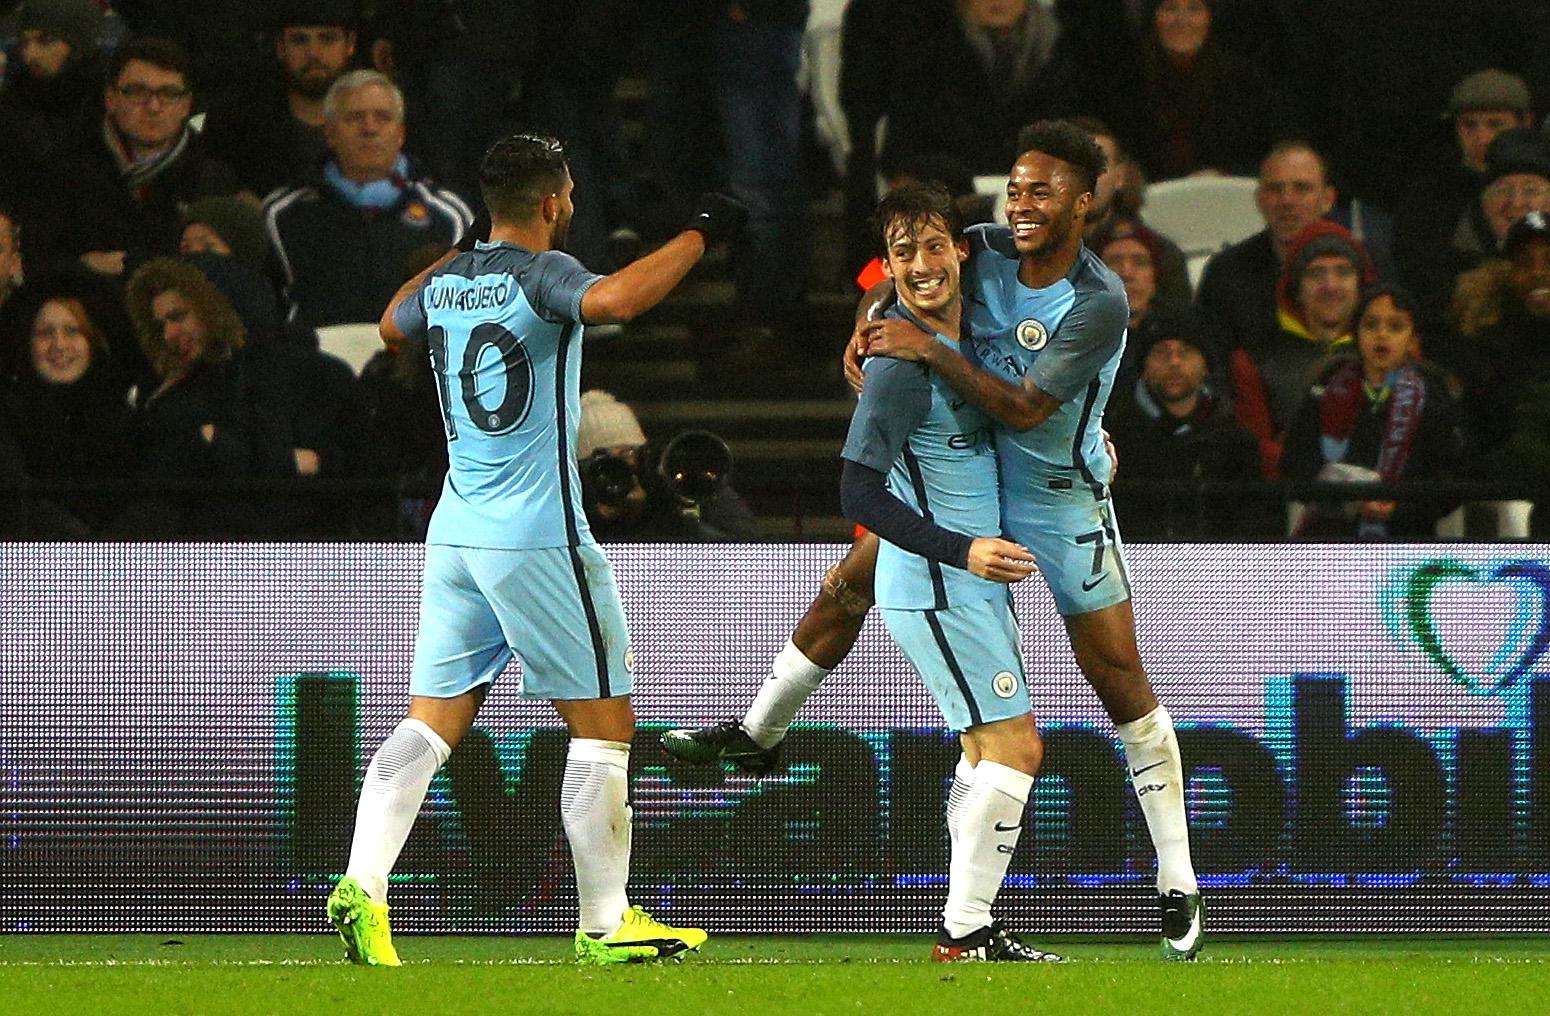 West Ham 0-5 Man City player ratings: David Silva stars to pile pressure onto Slaven Bilic